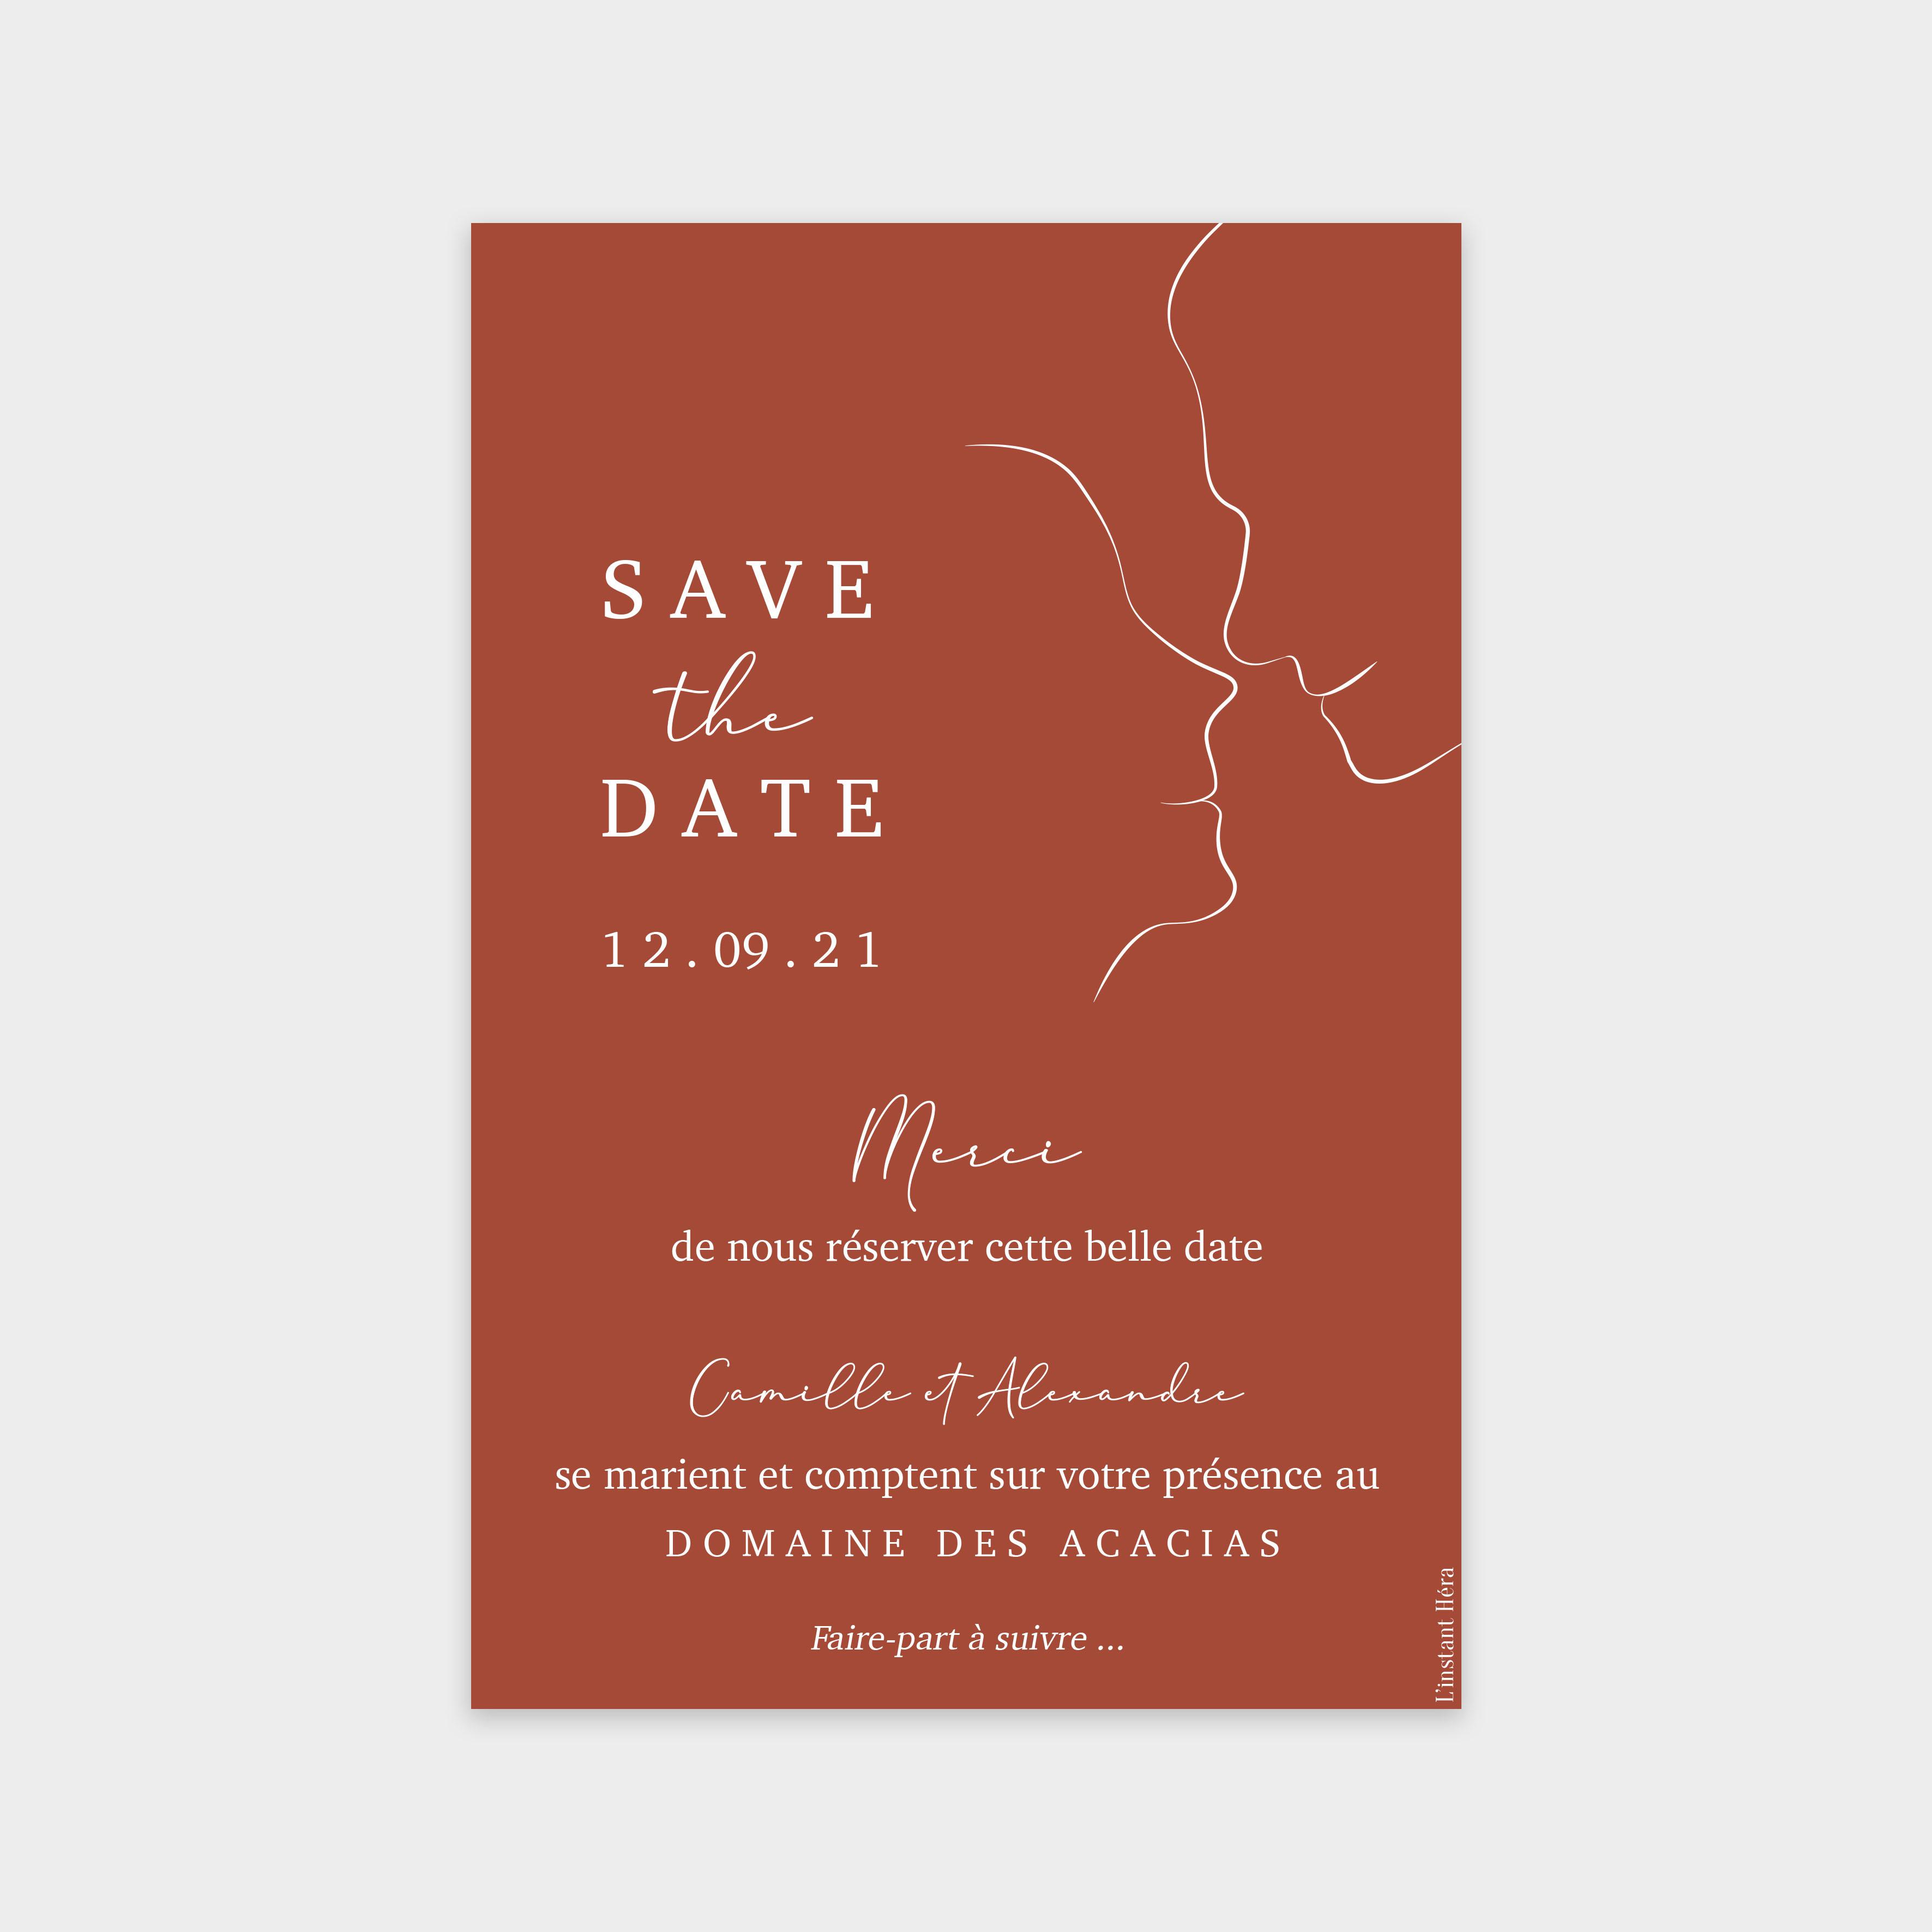 Save the date Regard toscane